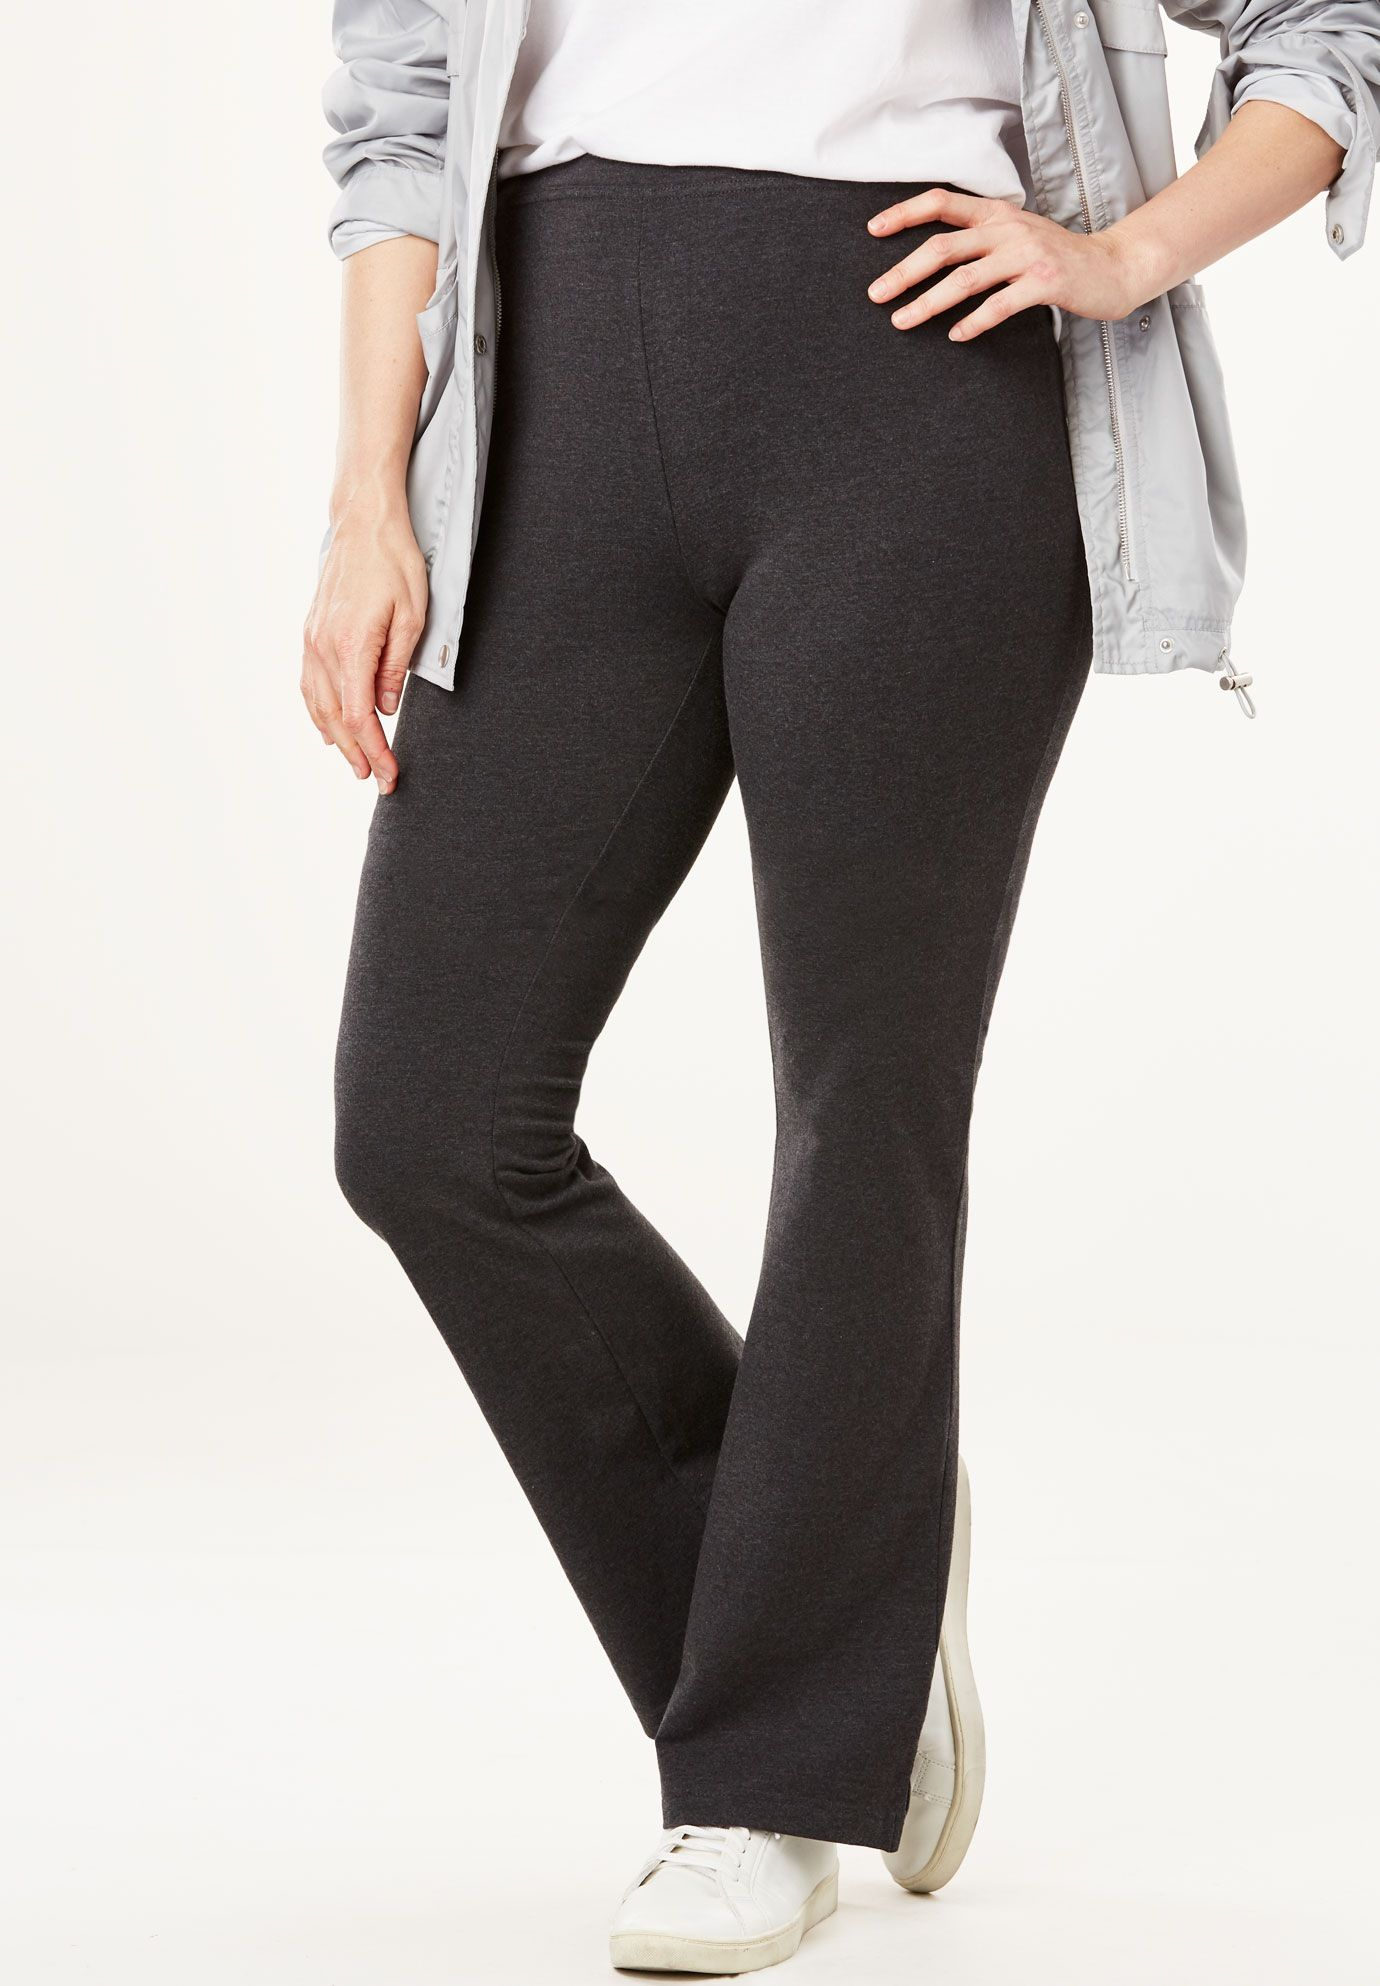 abb43b1c07e4b Stretch Cotton Bootcut Yoga Pant, HEATHER CHARCOAL, hi-res | cloths ...